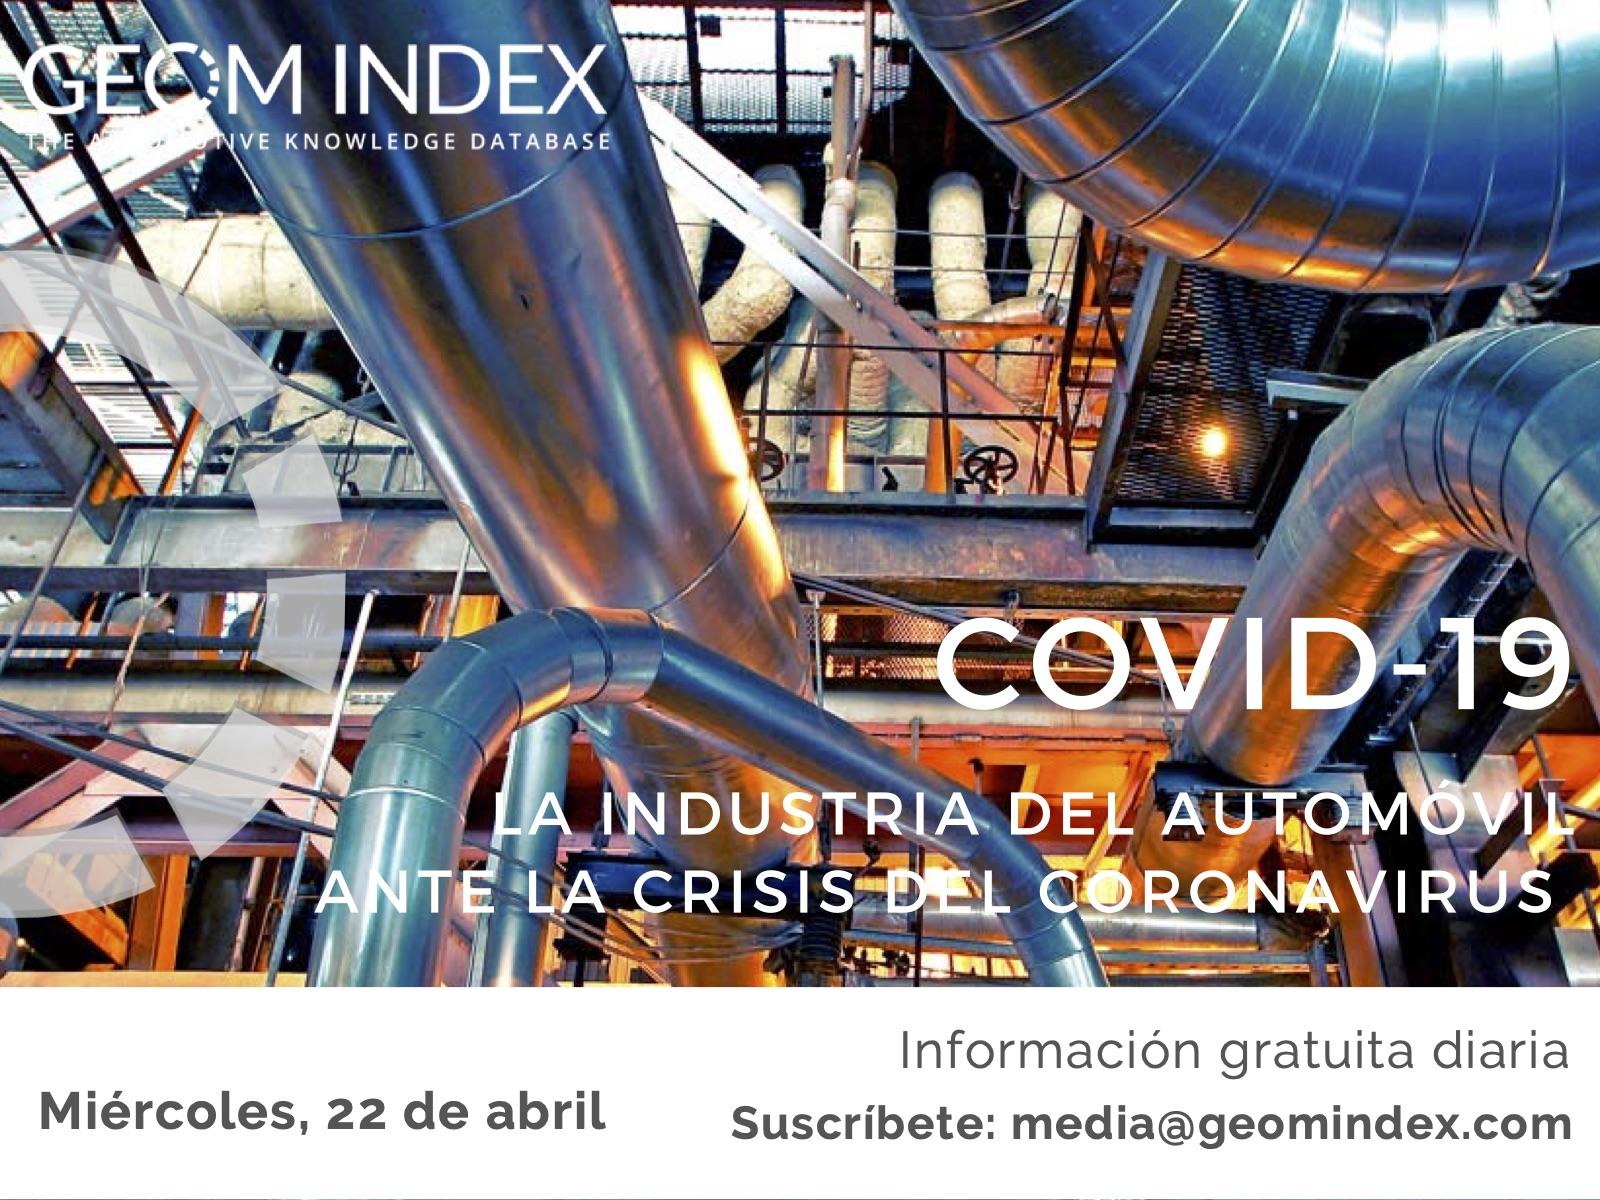 Informe 22 de abril – La industria del automóvil ante la crisis del Covid-19